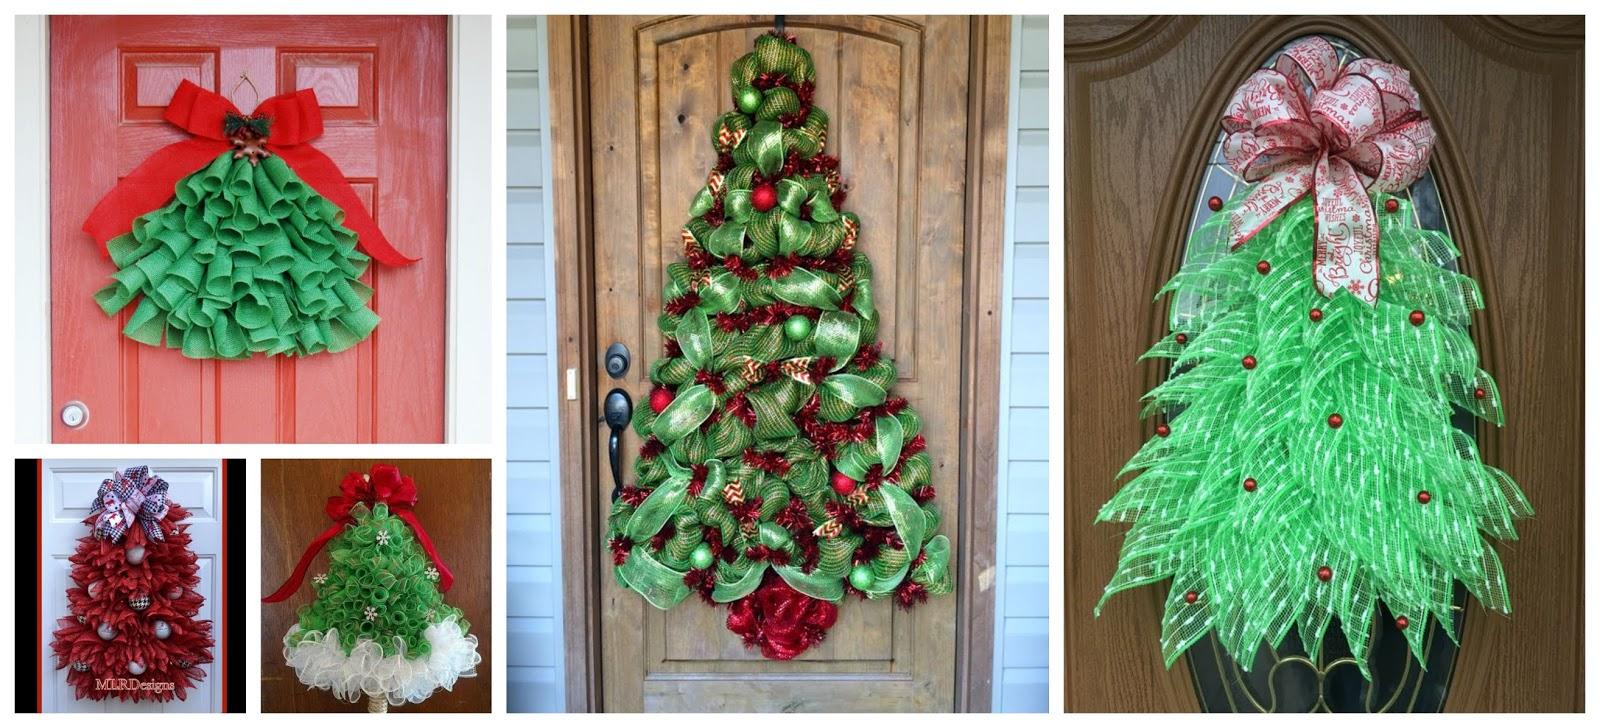 Haz rbolitos navide os con mallas para decorar puertas en for Disenos navidenos para decorar puertas